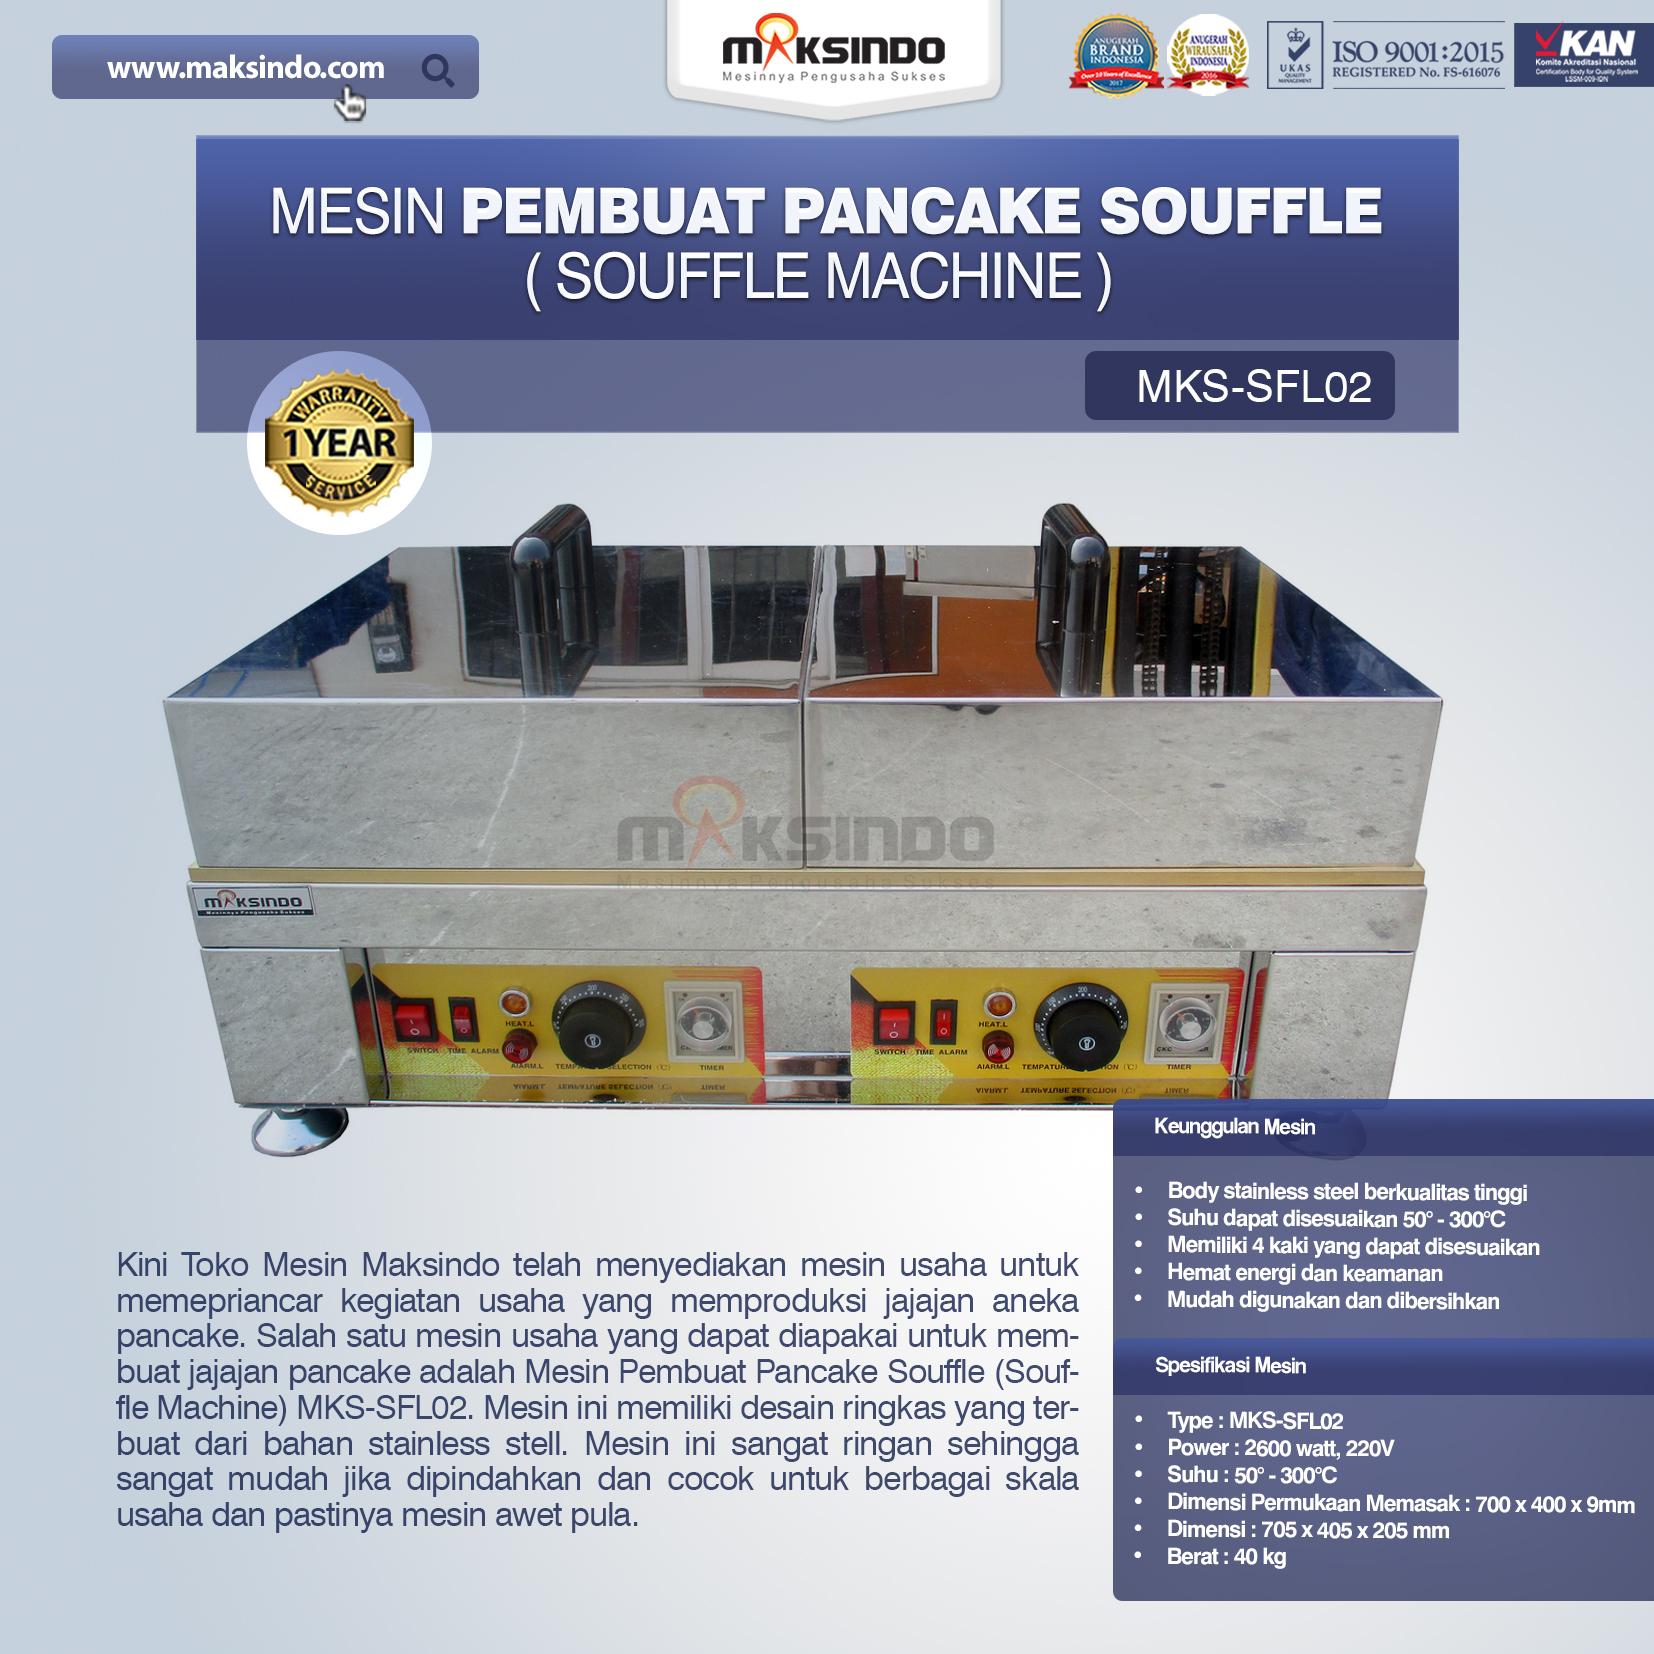 Jual Mesin Pembuat Pancake Souffle (Souffle Machine) MKS-SFL02 di Mataram